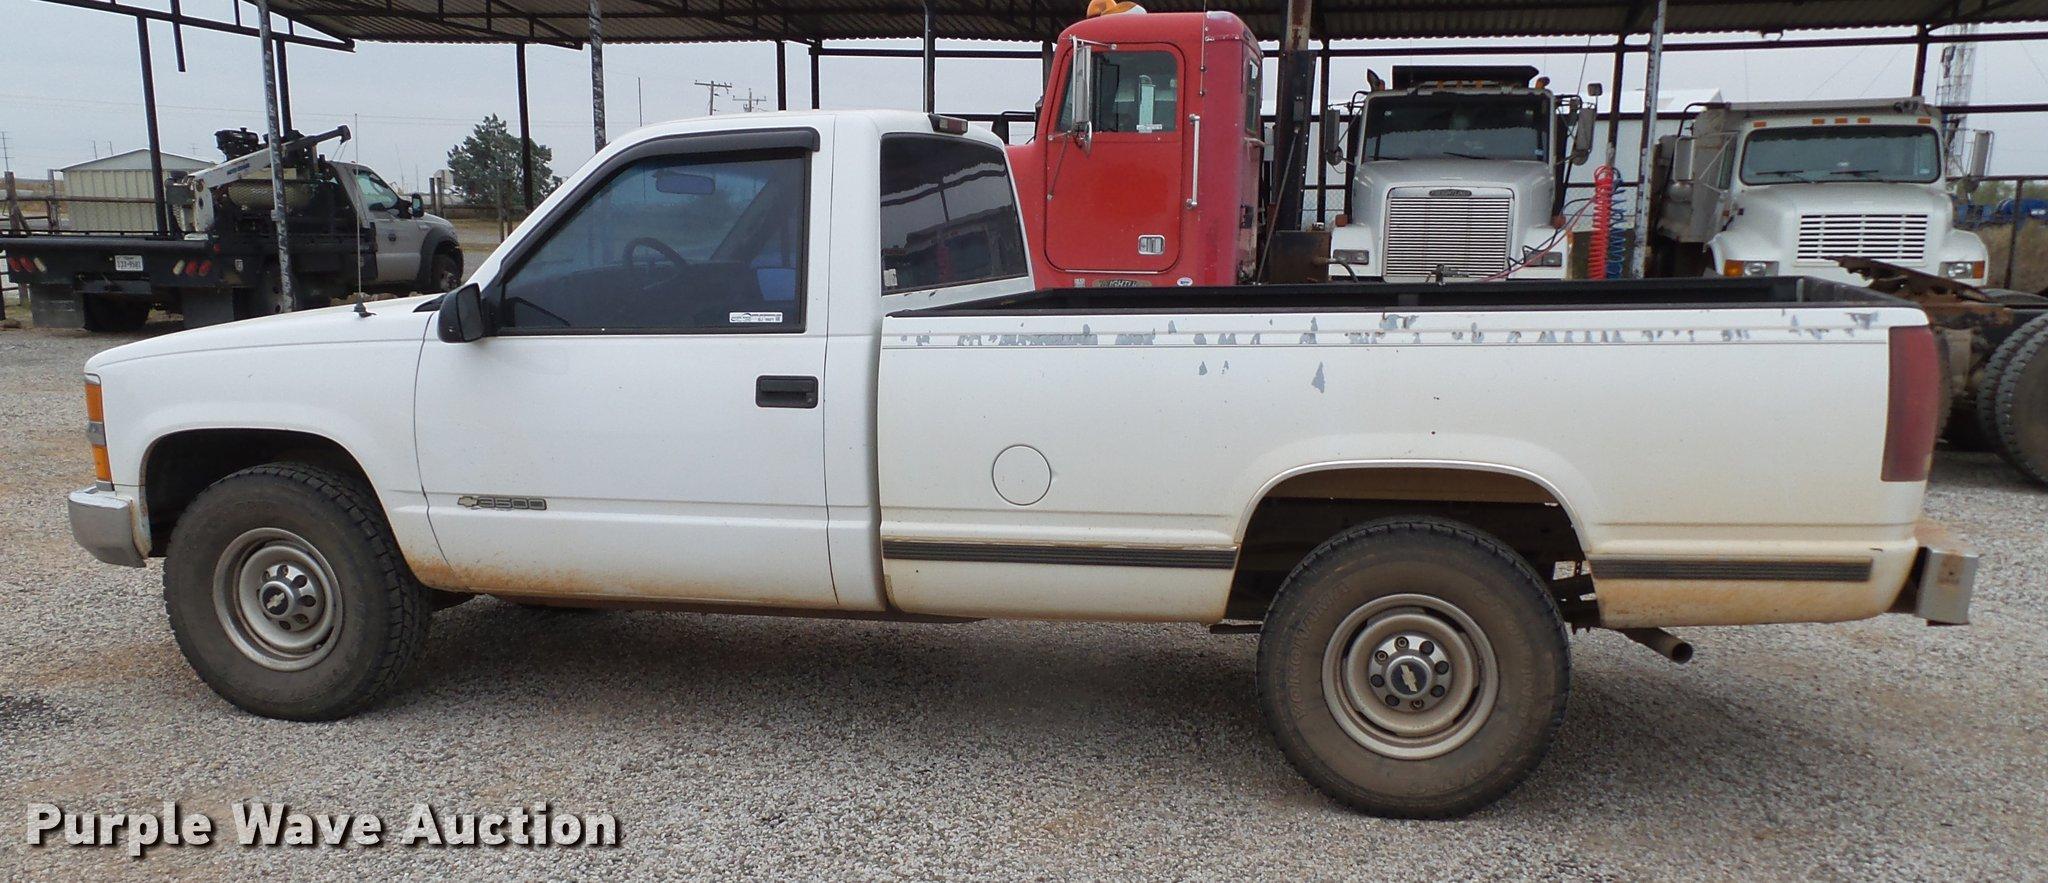 All Chevy 99 chevy 3500 : 2000 Chevrolet 3500 pickup truck | Item BJ9921 | SOLD! Decem...